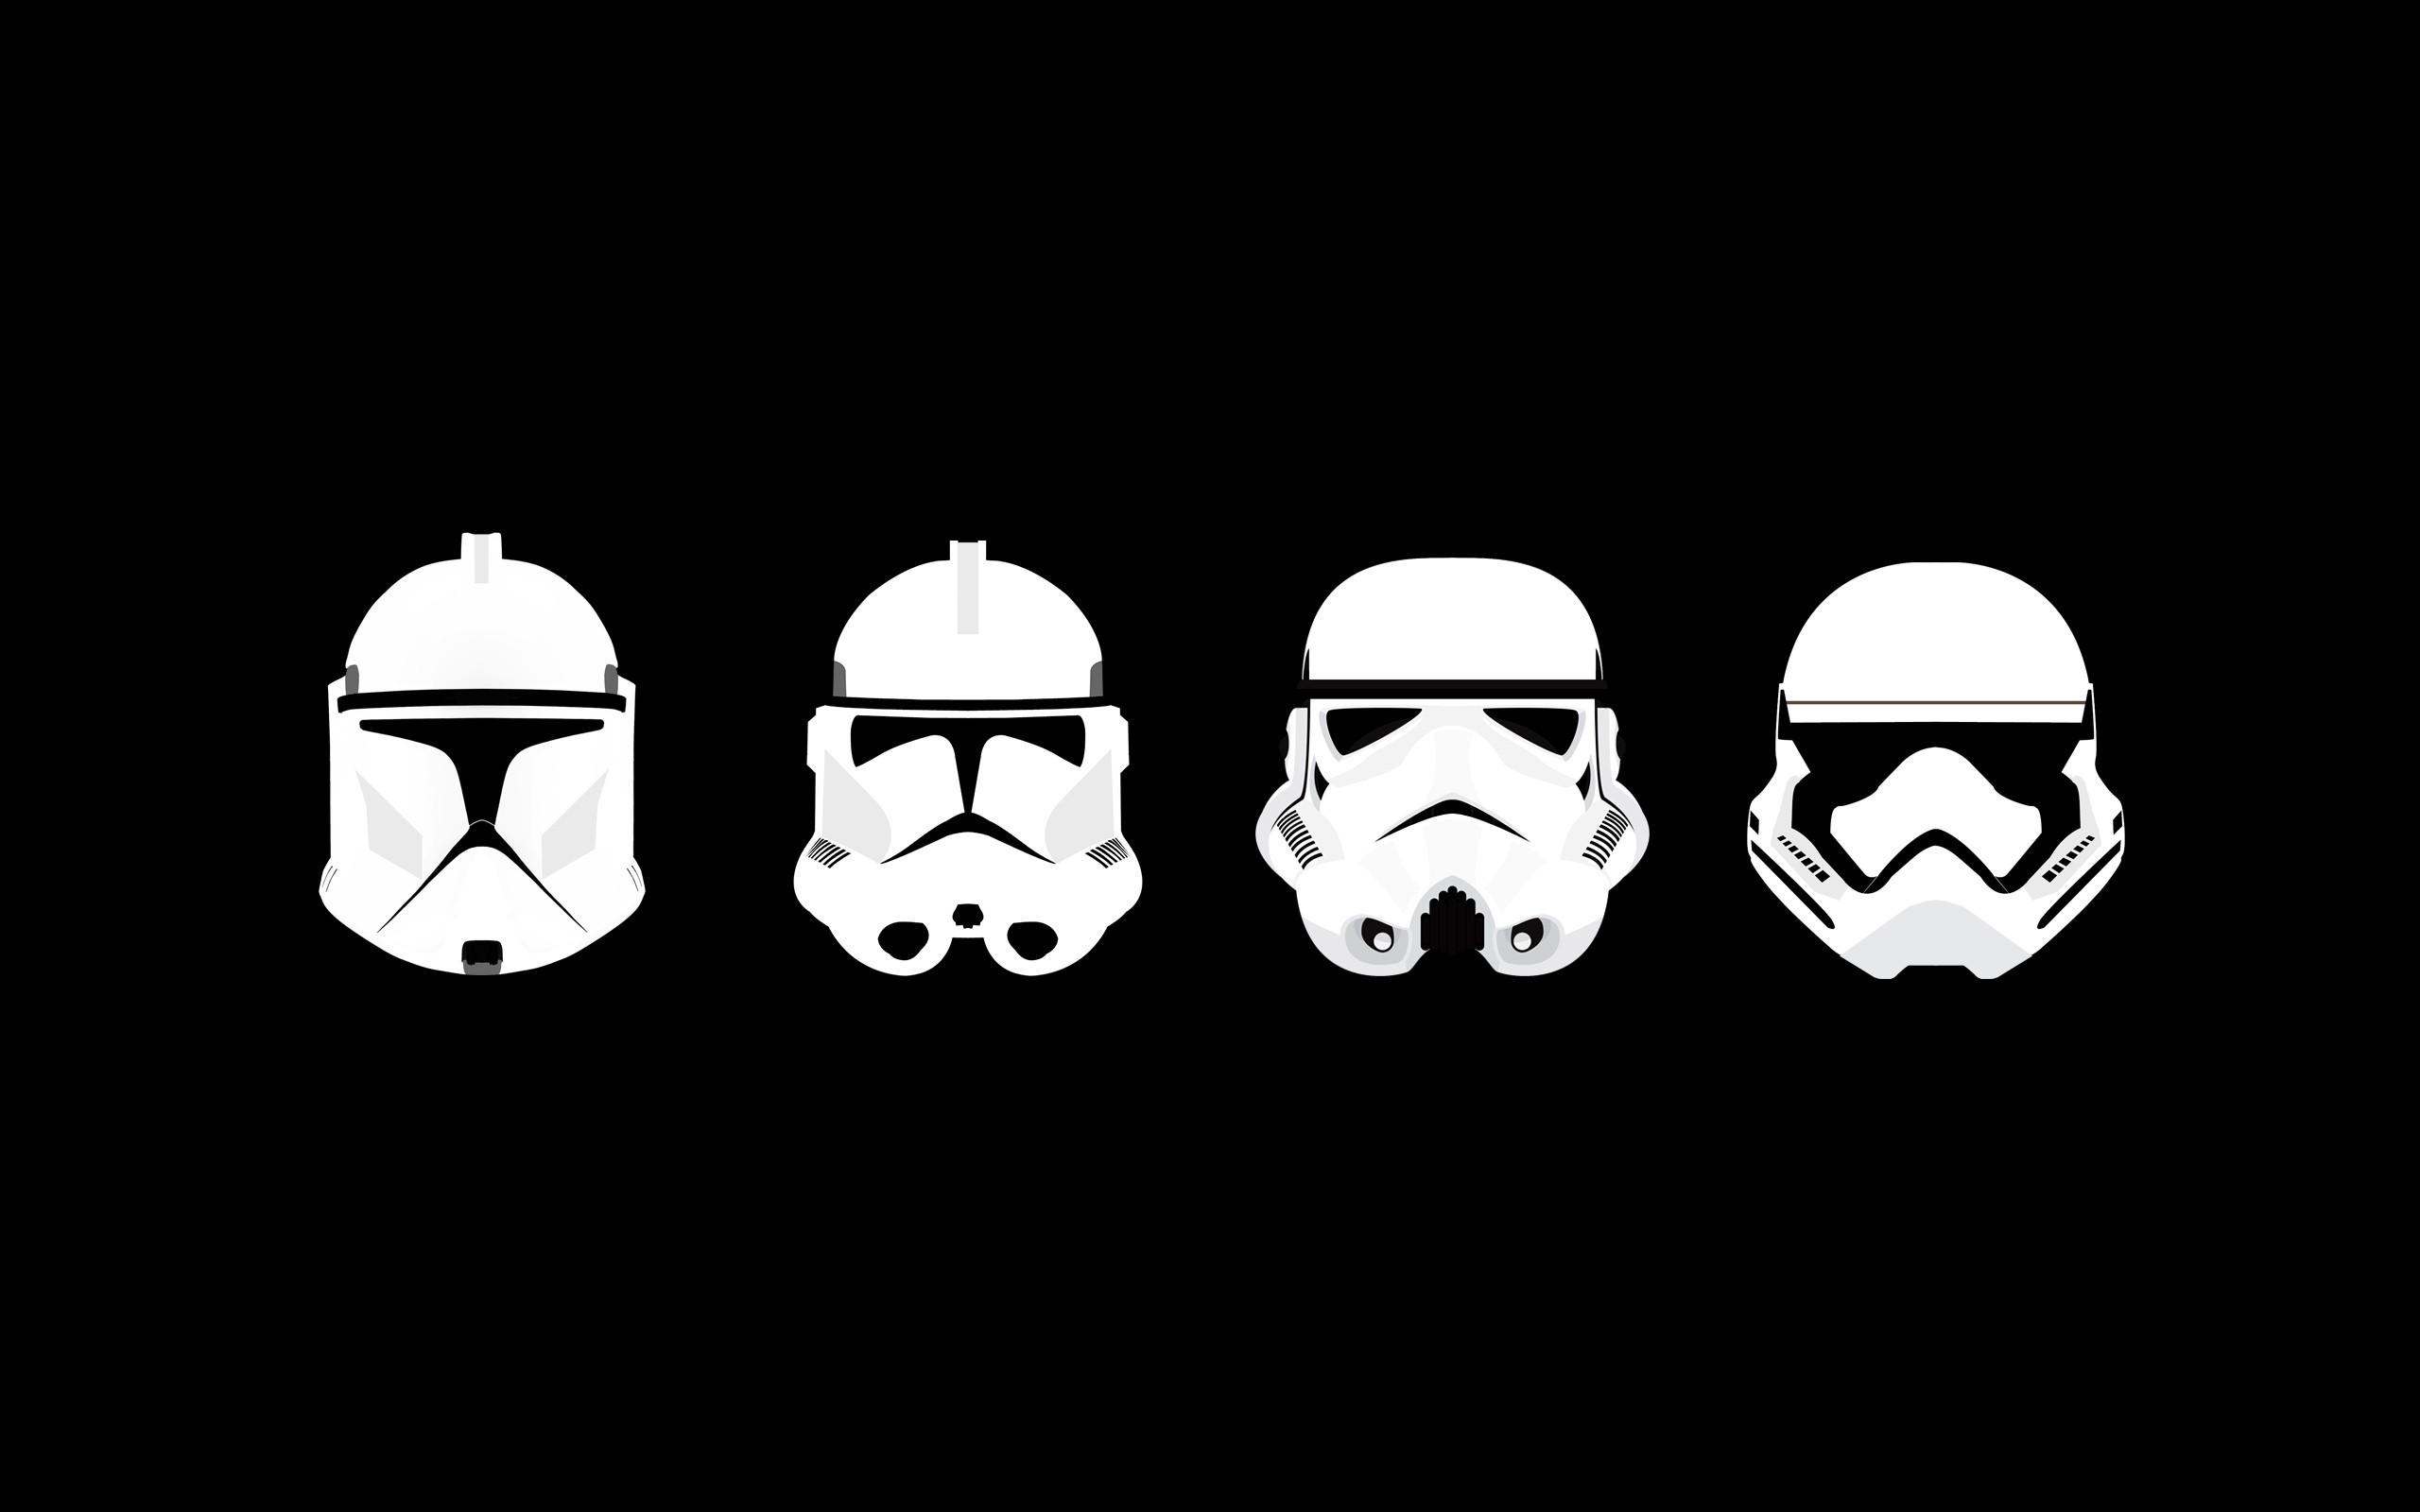 72+ Hd Stormtrooper Wallpapers on WallpaperPlay